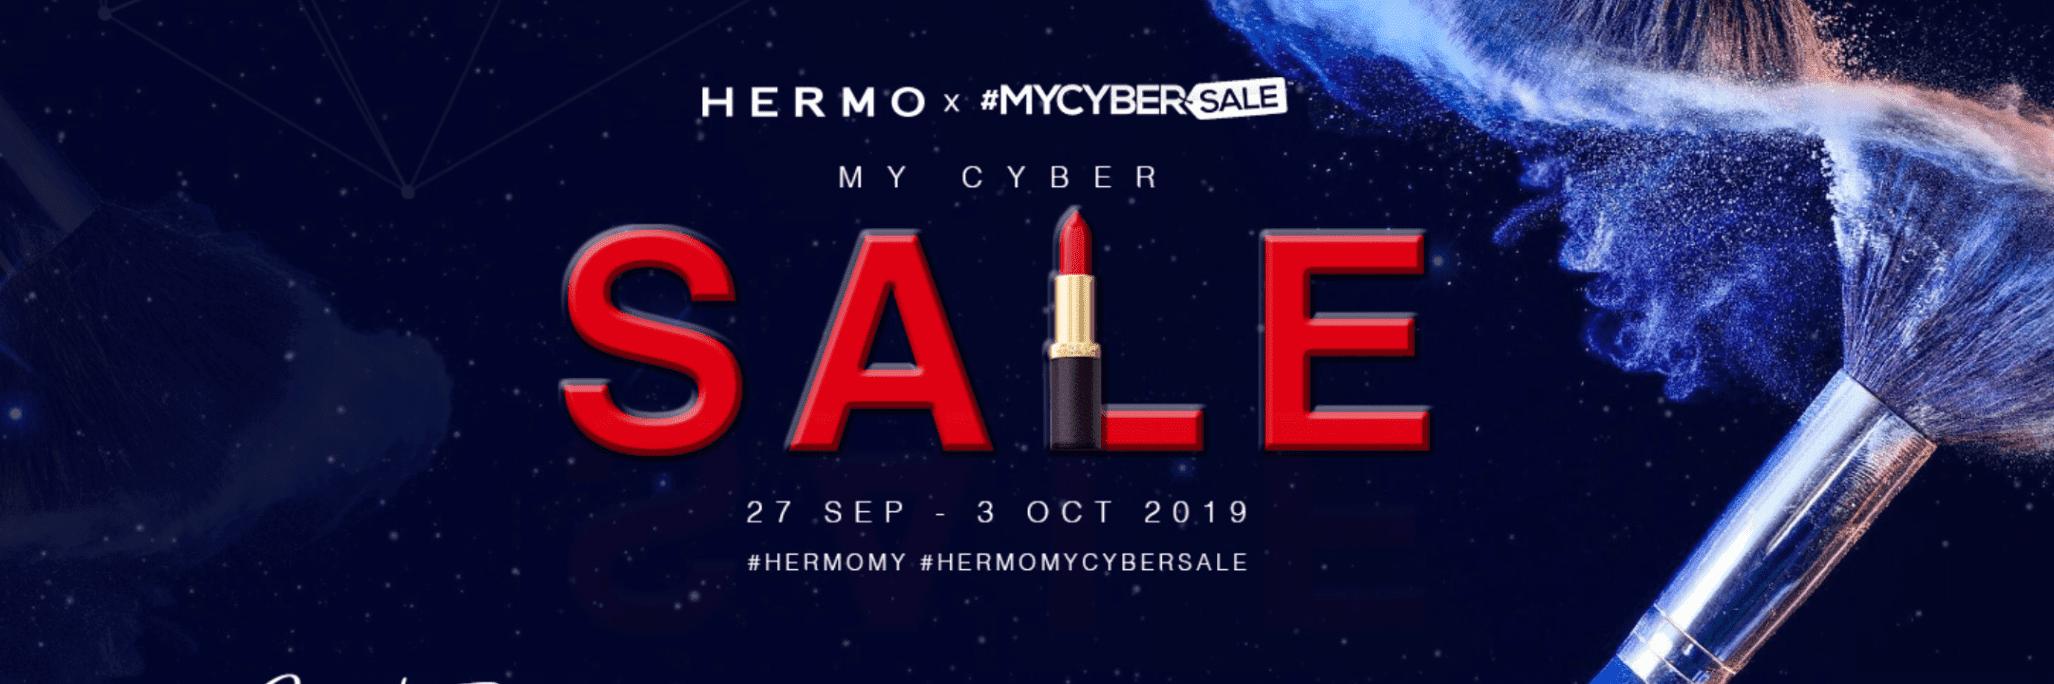 hermo mycybersale 2019